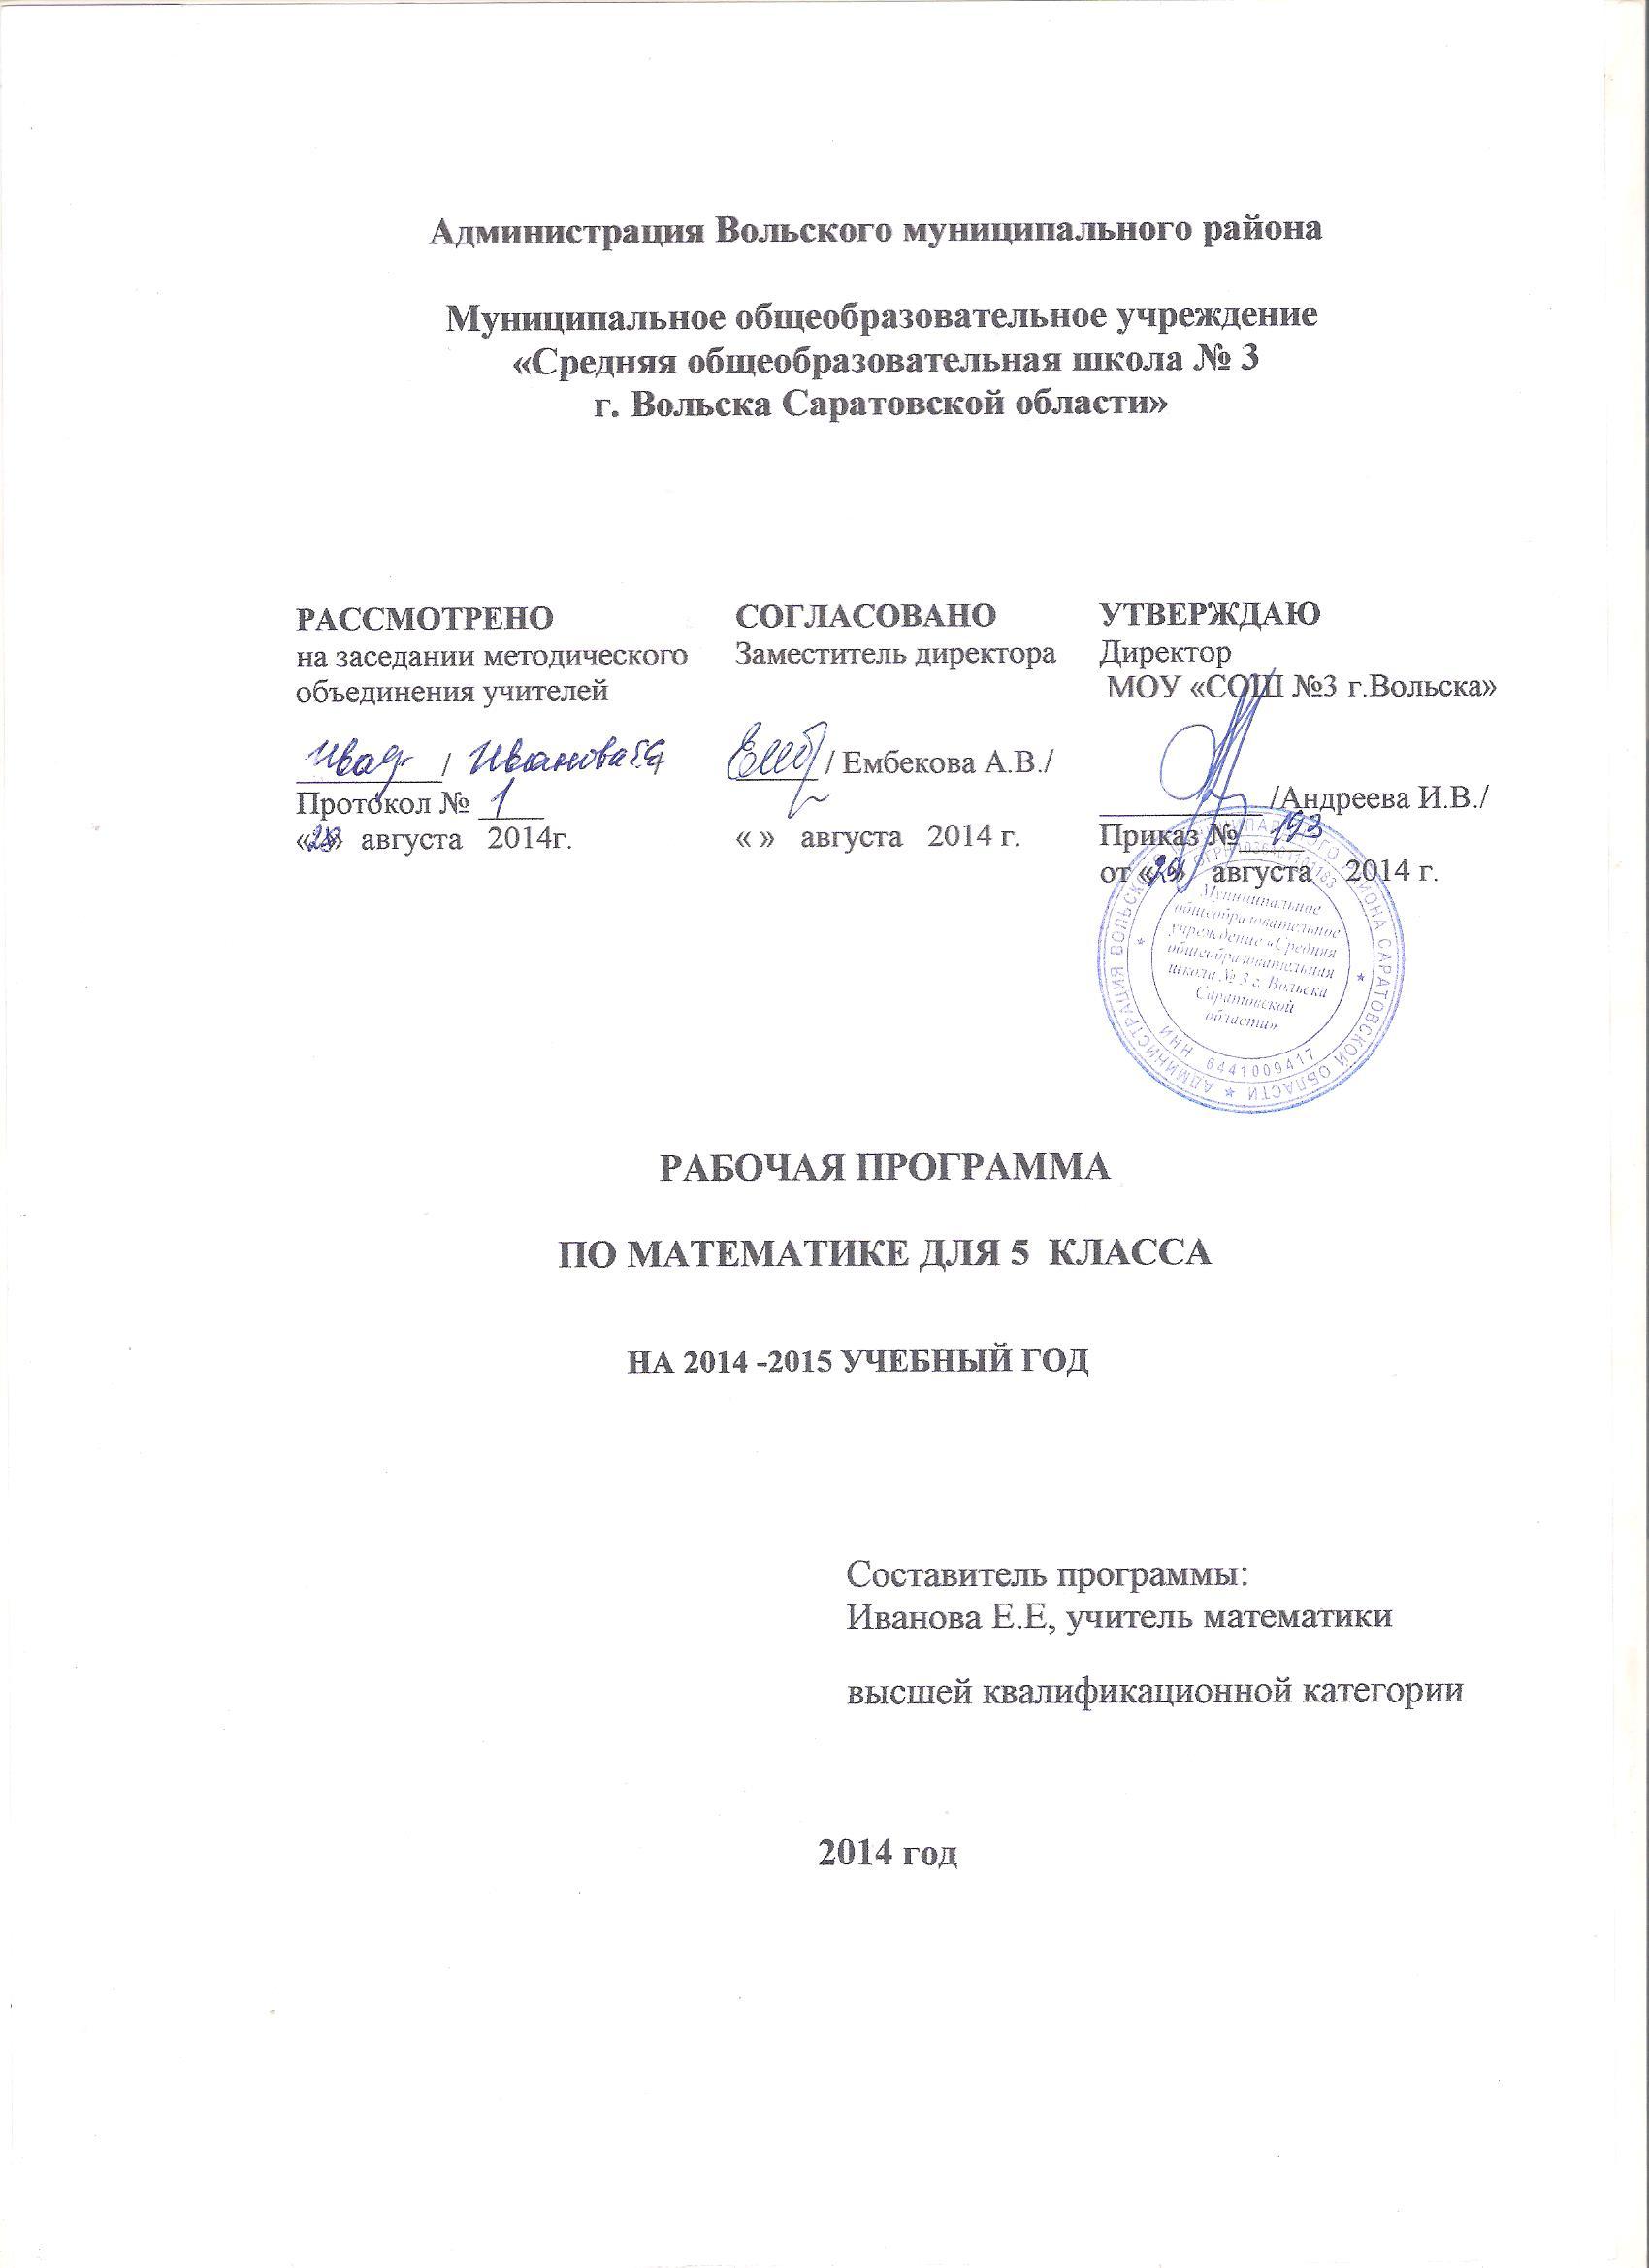 C:\Users\Елена\Documents\рабочие программы 2014-2015\титулы 2014\2014-09-05 5 класс 14\5 класс 14 001.jpg